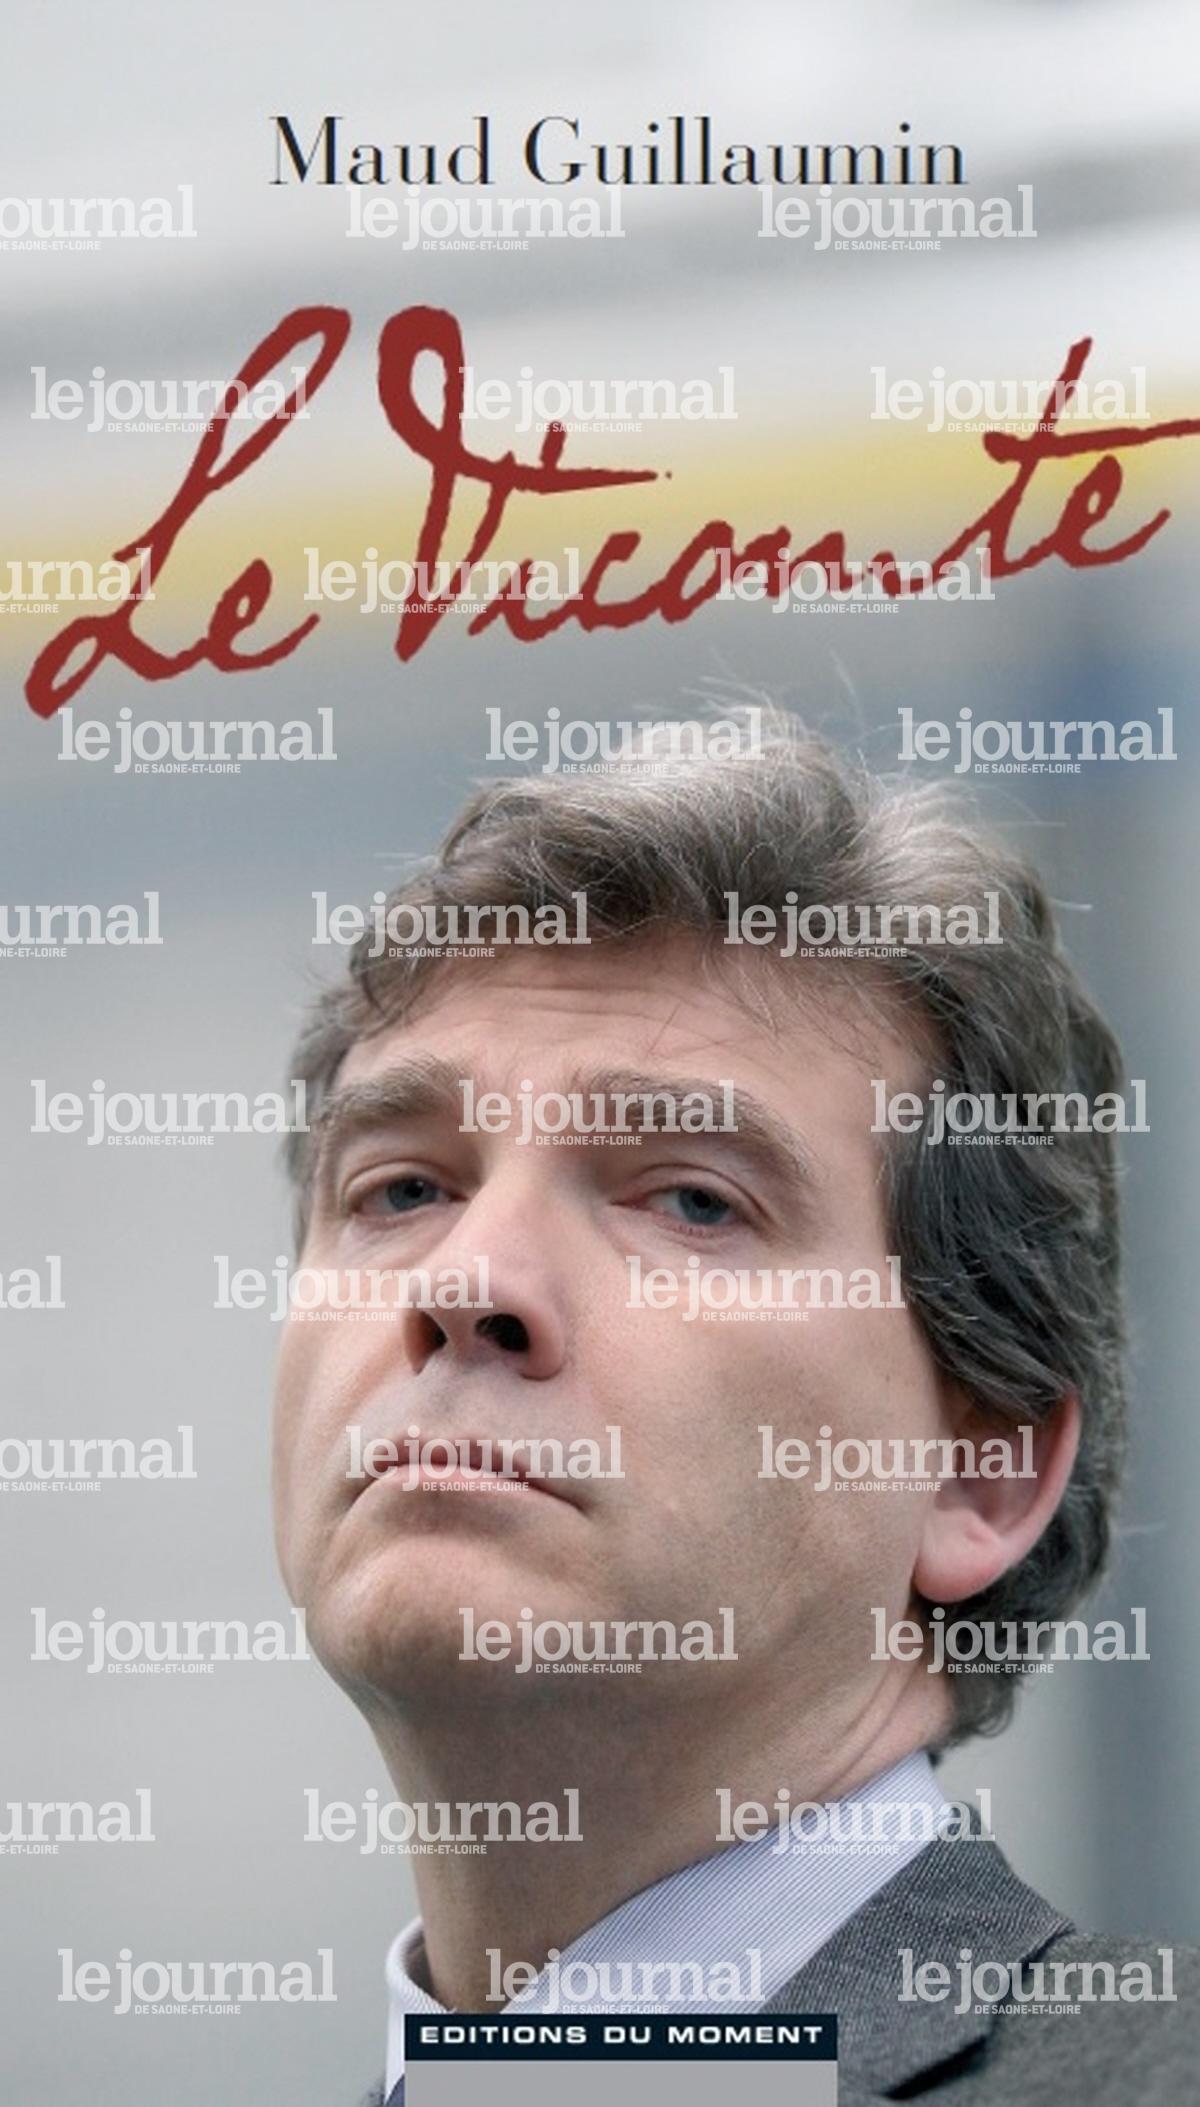 le-vicomte-de-maud-guillaumin - le-vicomte-de-maud-guillaumin